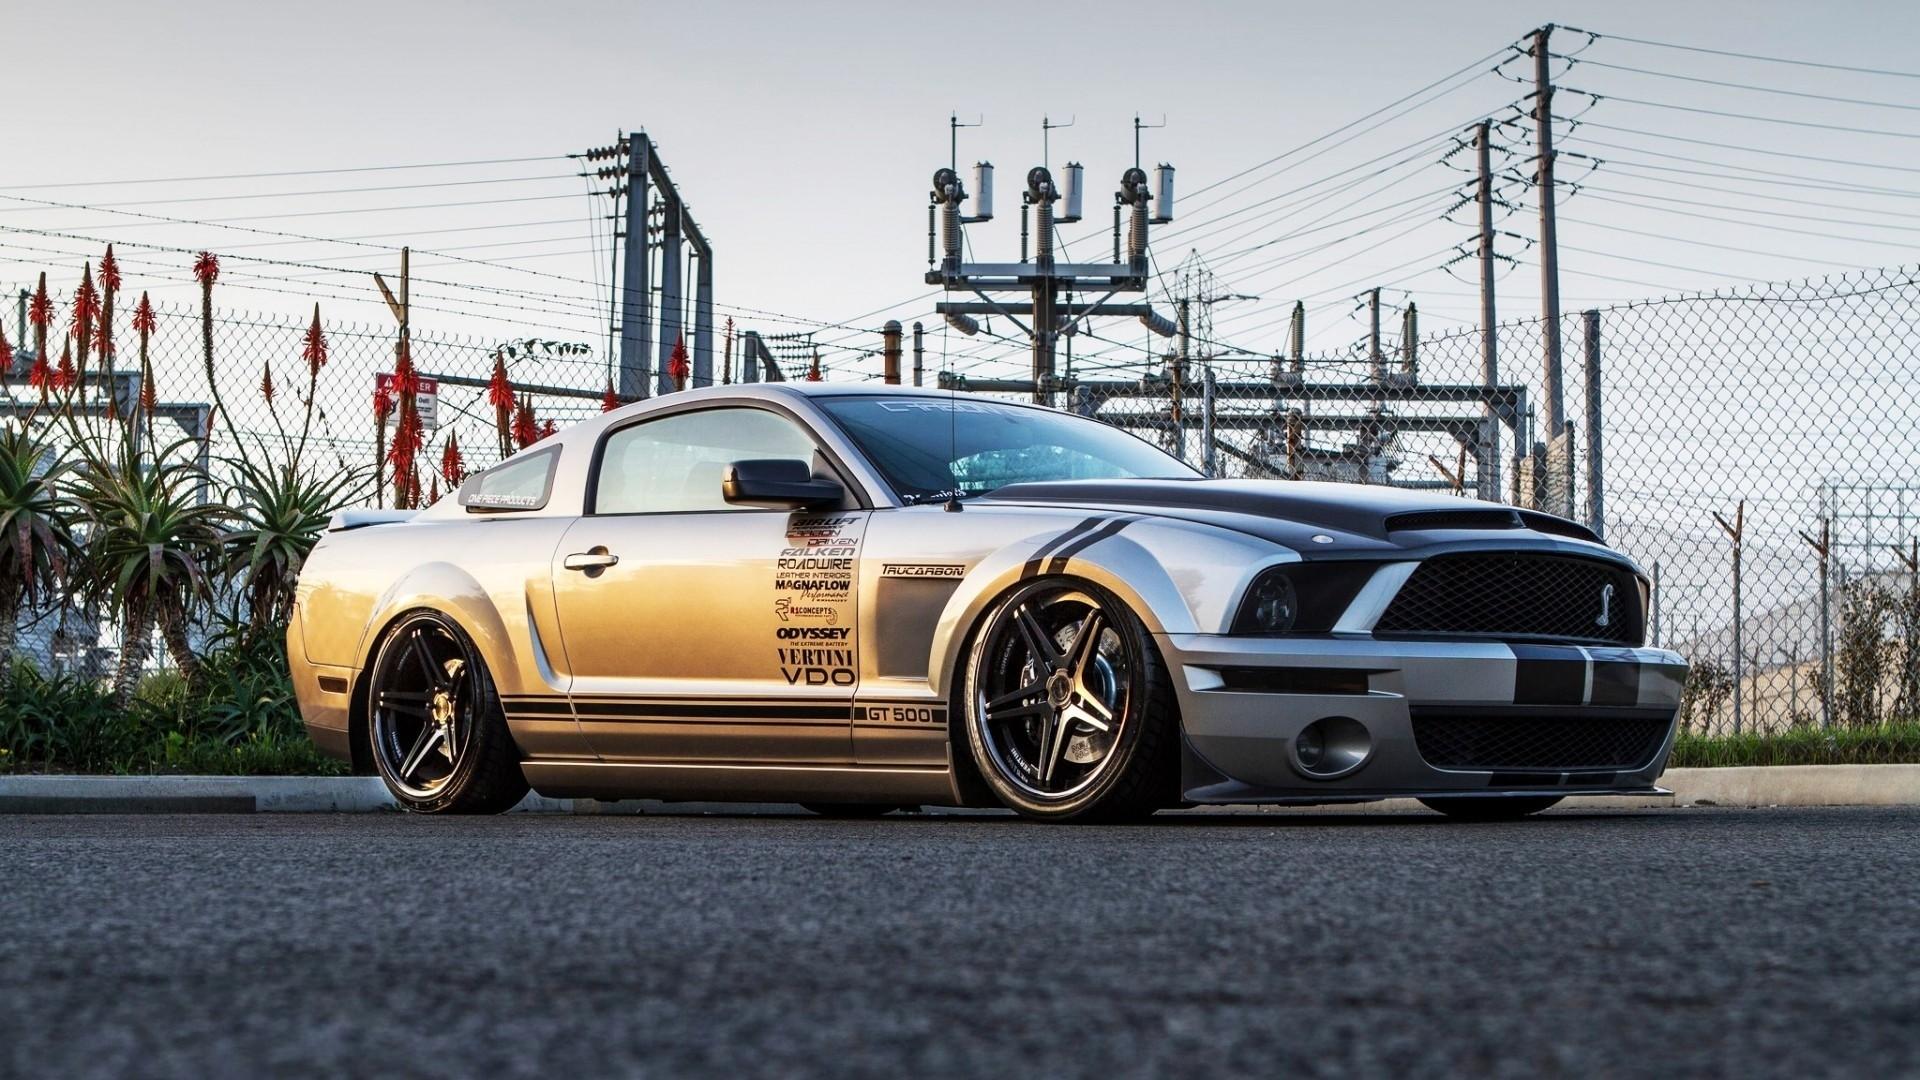 Shelby Cobra GT500 Wallpaper HD 44661